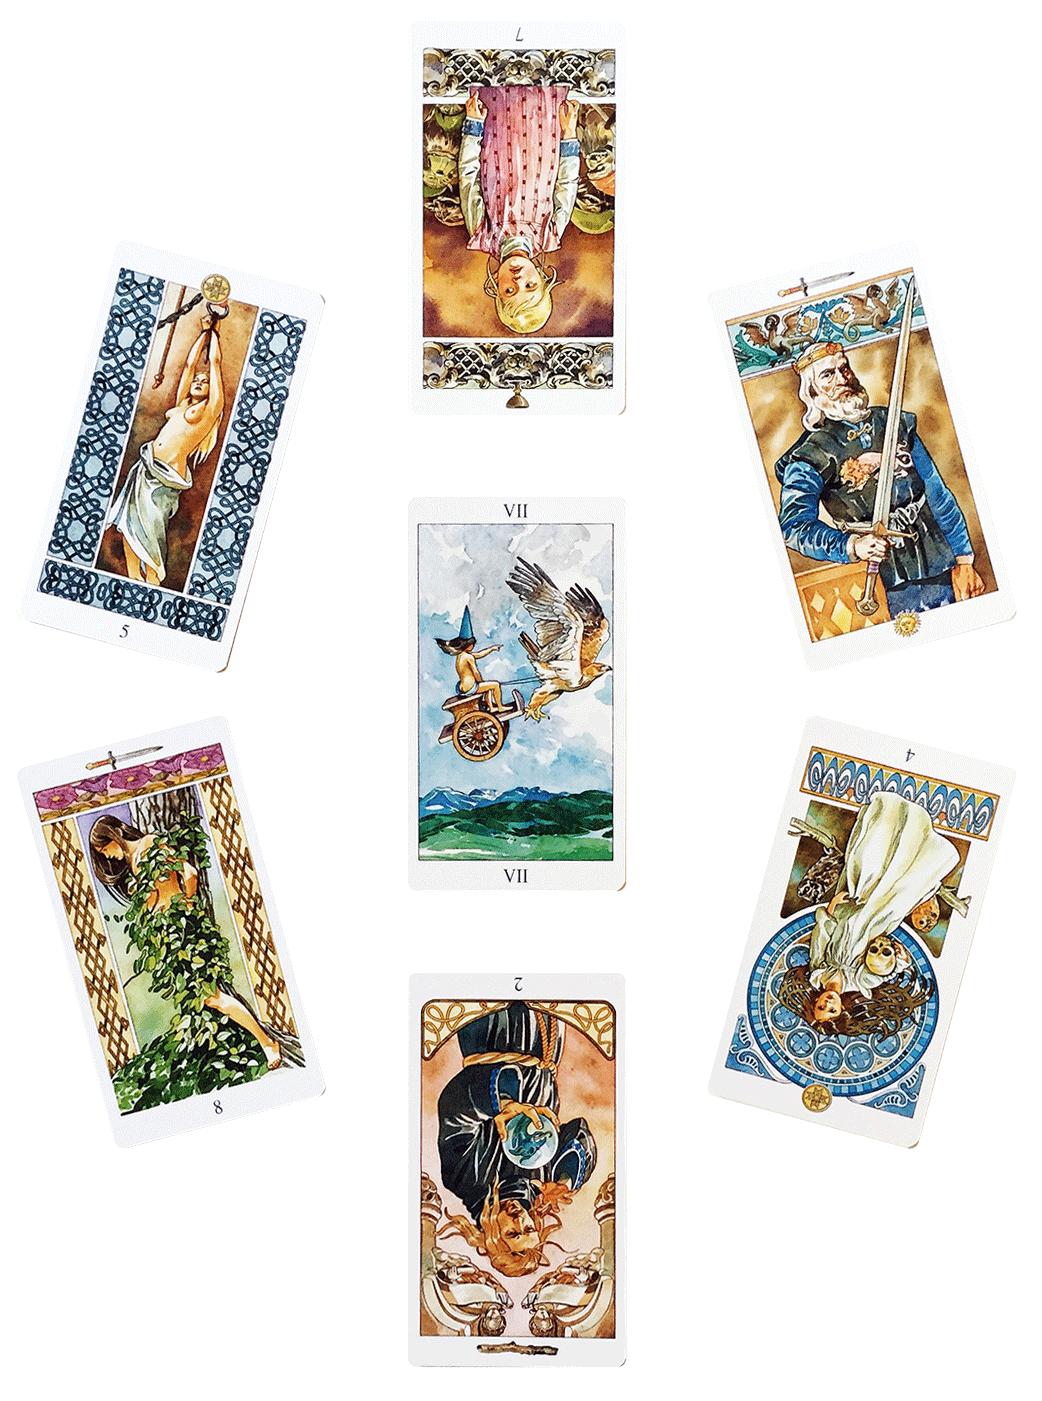 A New Year Tarot Spread + My Cards for 2019 – ILLUMINATE HOPE